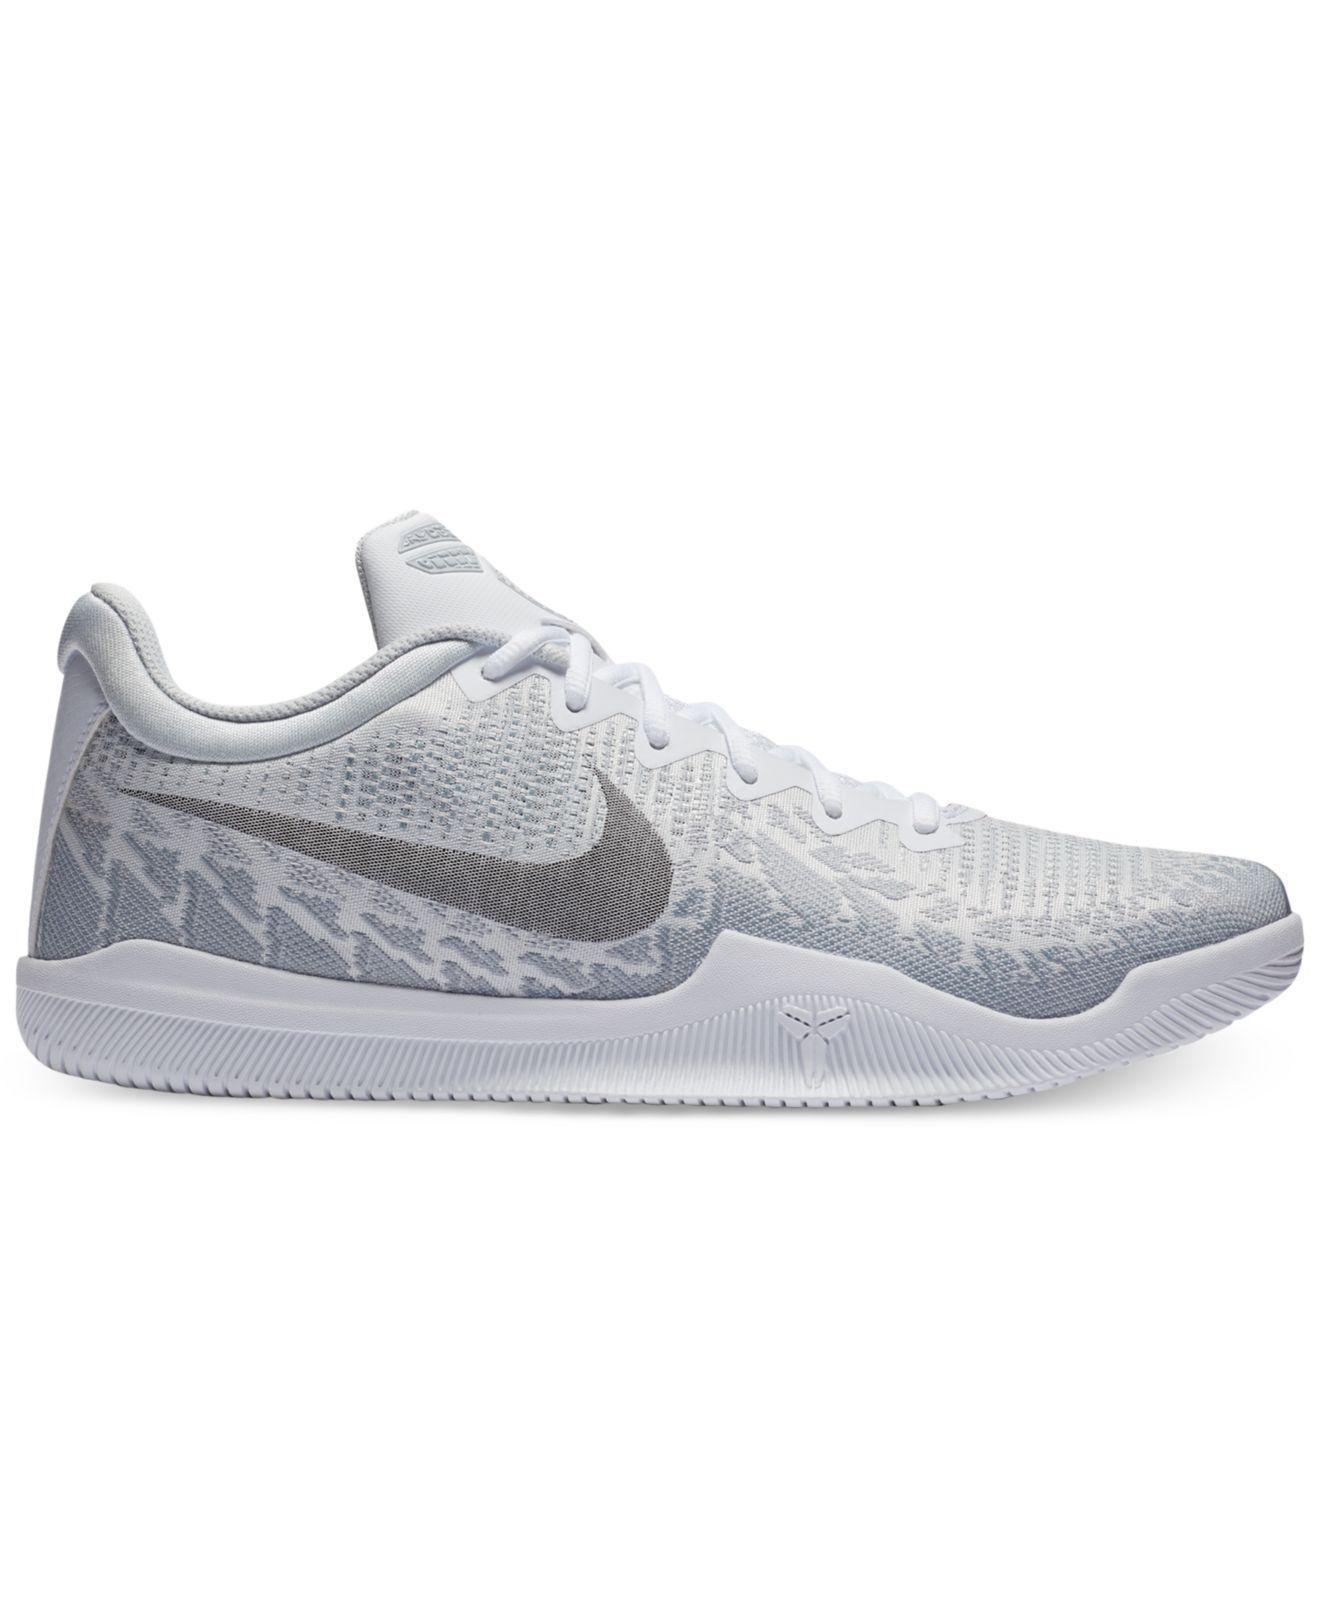 d9e126dc2ab Nike. Men s Gray Kobe Mamba Rage Basketball Sneakers From Finish Line ...